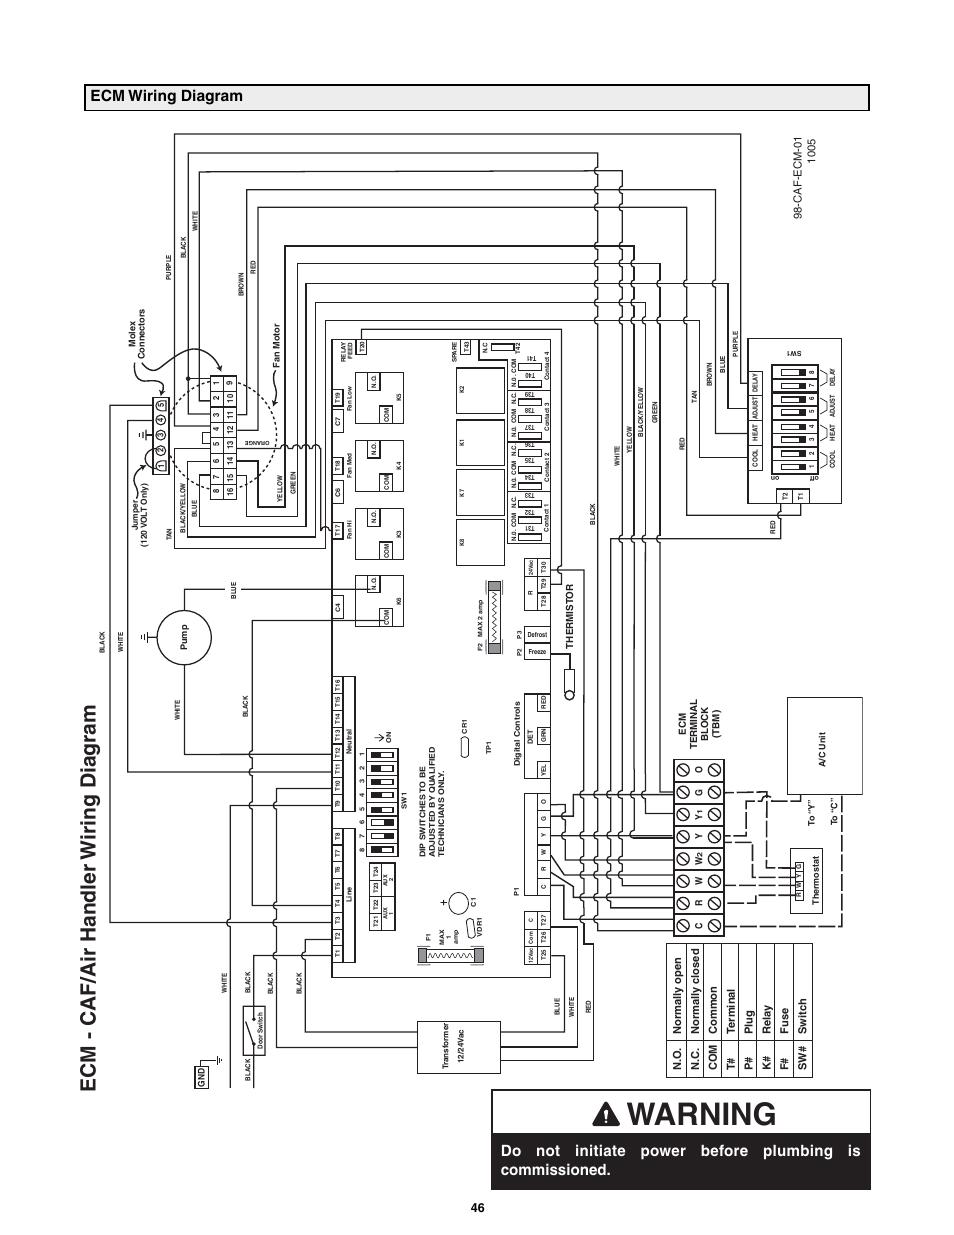 Warning Ecm Caf Air Handler Wiring Dia Gram Lifebreath Clean T35 Diagram Furnace 02 Mb User Manual Page 46 48